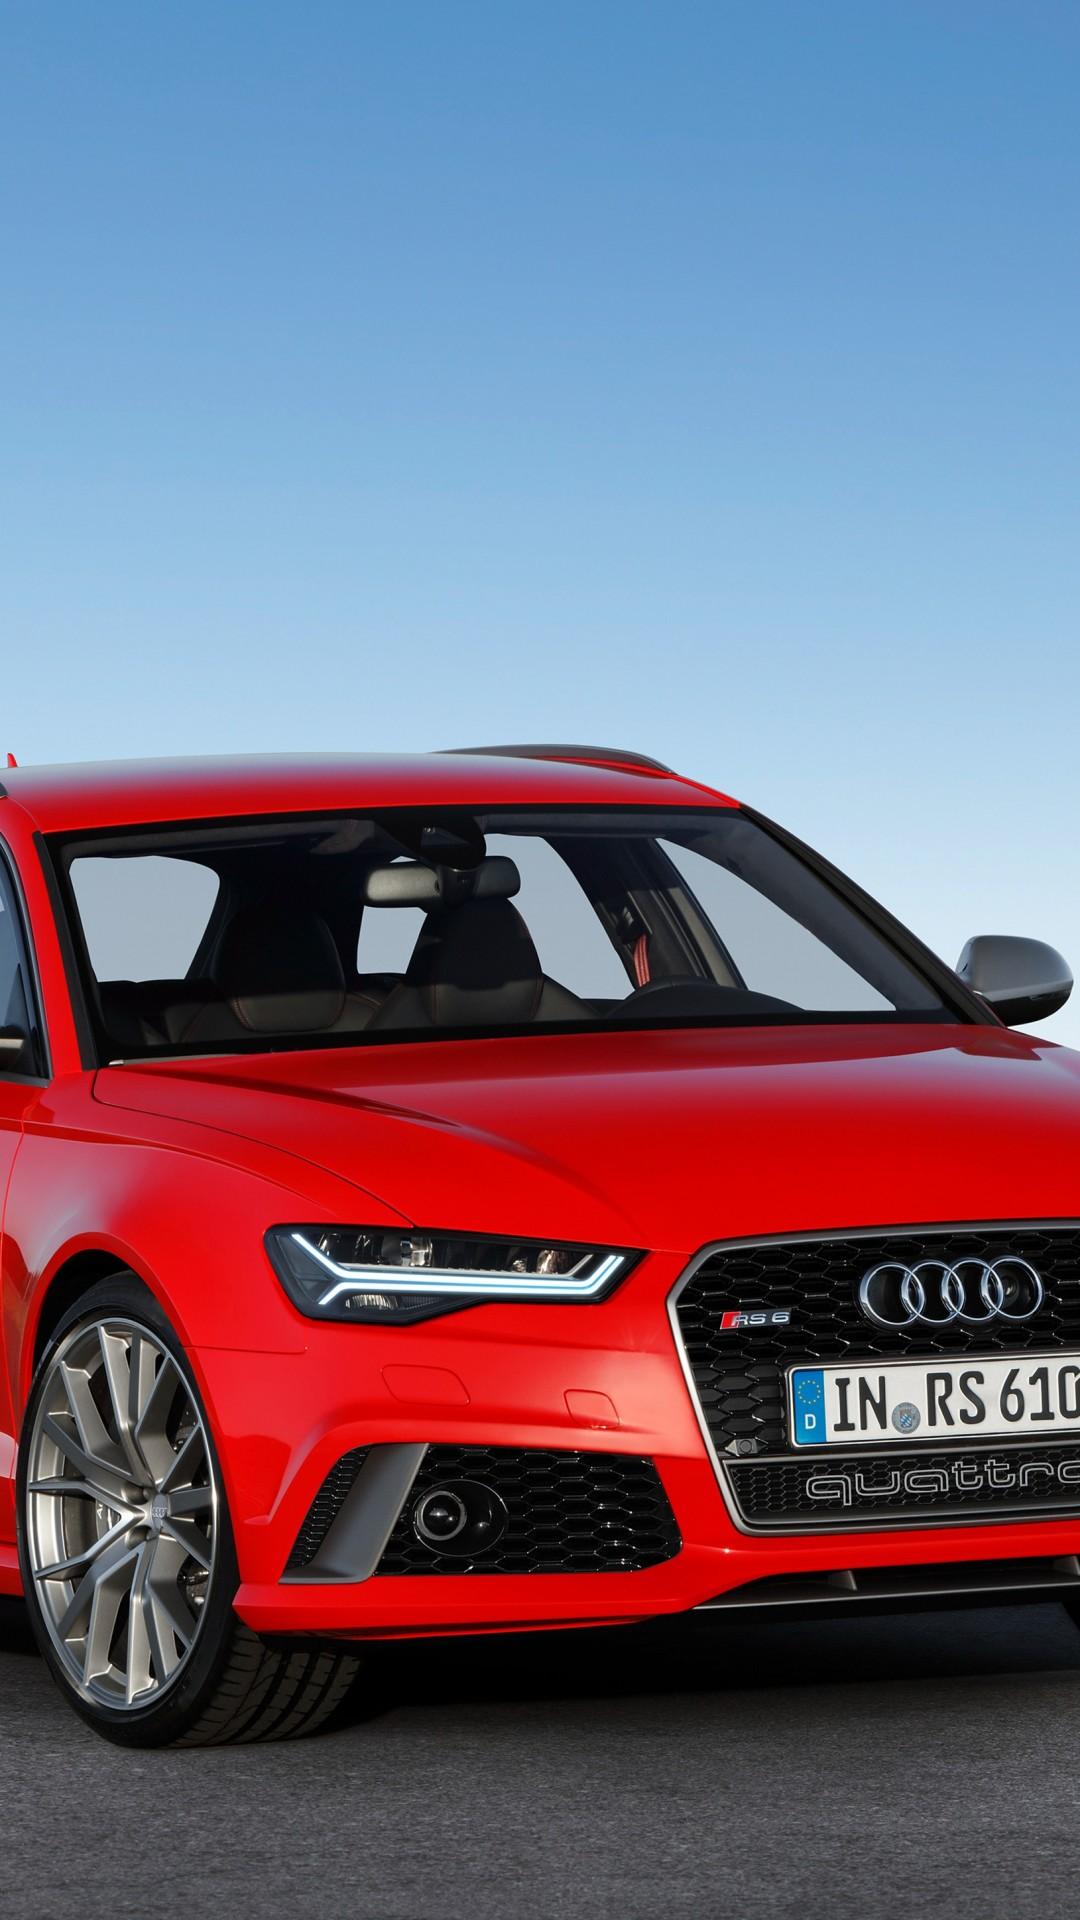 Luxury Wallpaper Audi Rs6 Red Luxury Cars Sky